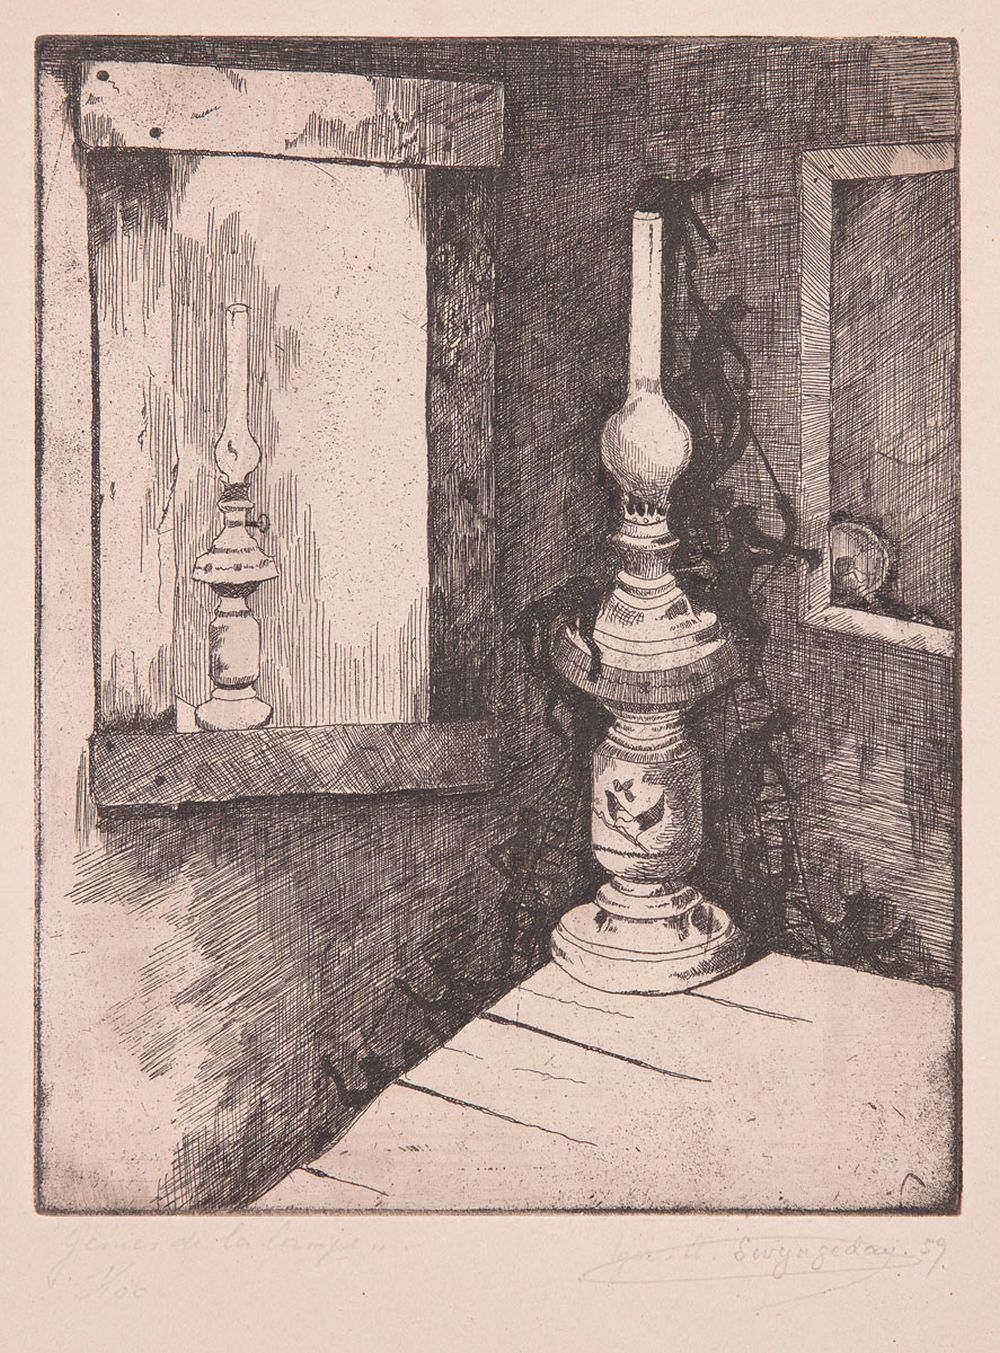 Igor-Albert SWINGEDAU ou SWYNGEDAU (Ixelles, 1939 - 200